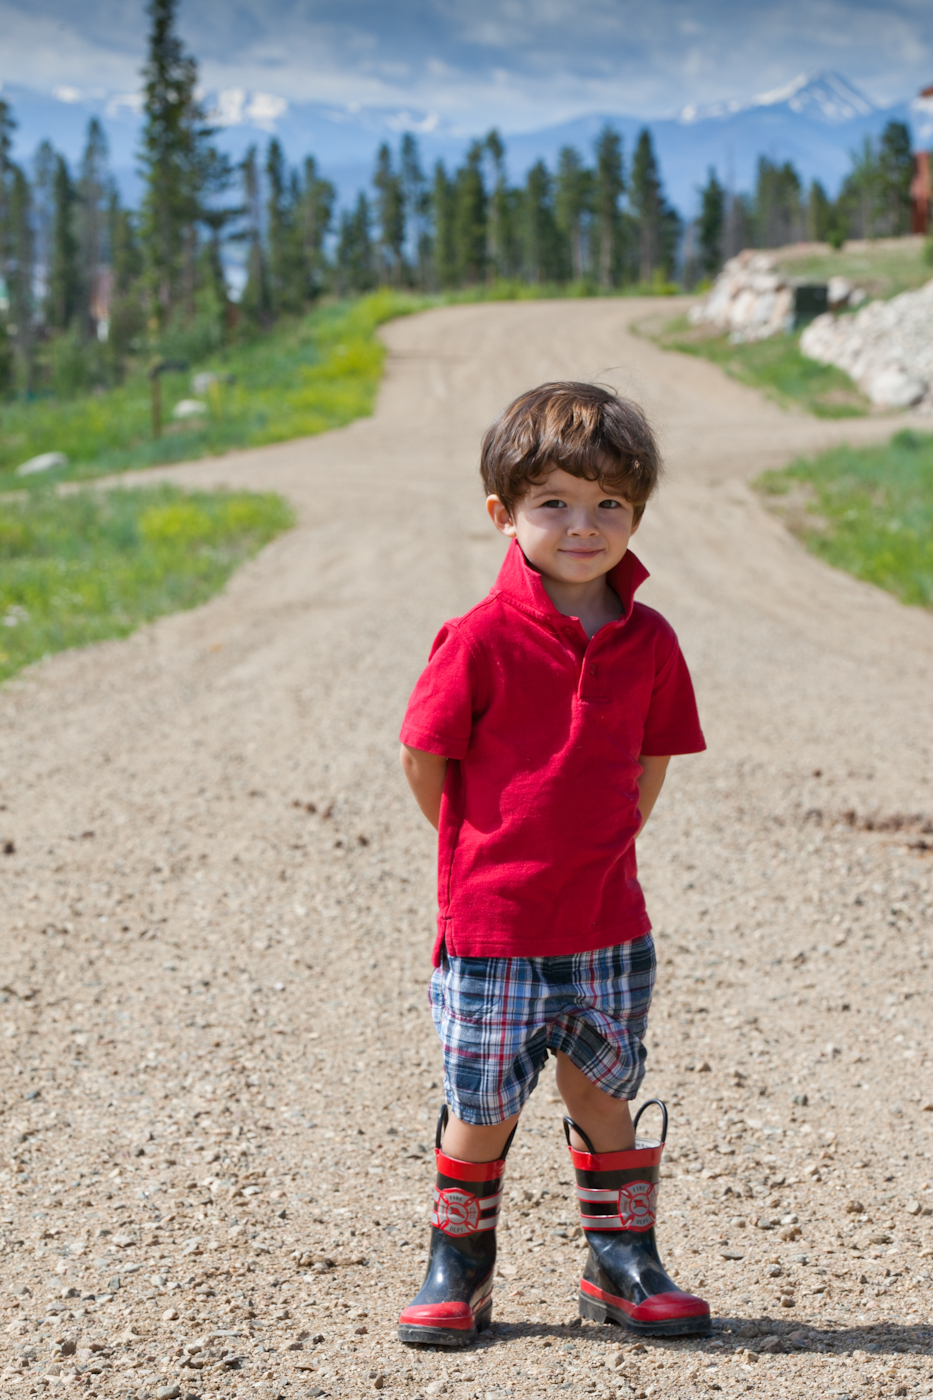 Childrens-photographer-vail-Axelphoto.jpg